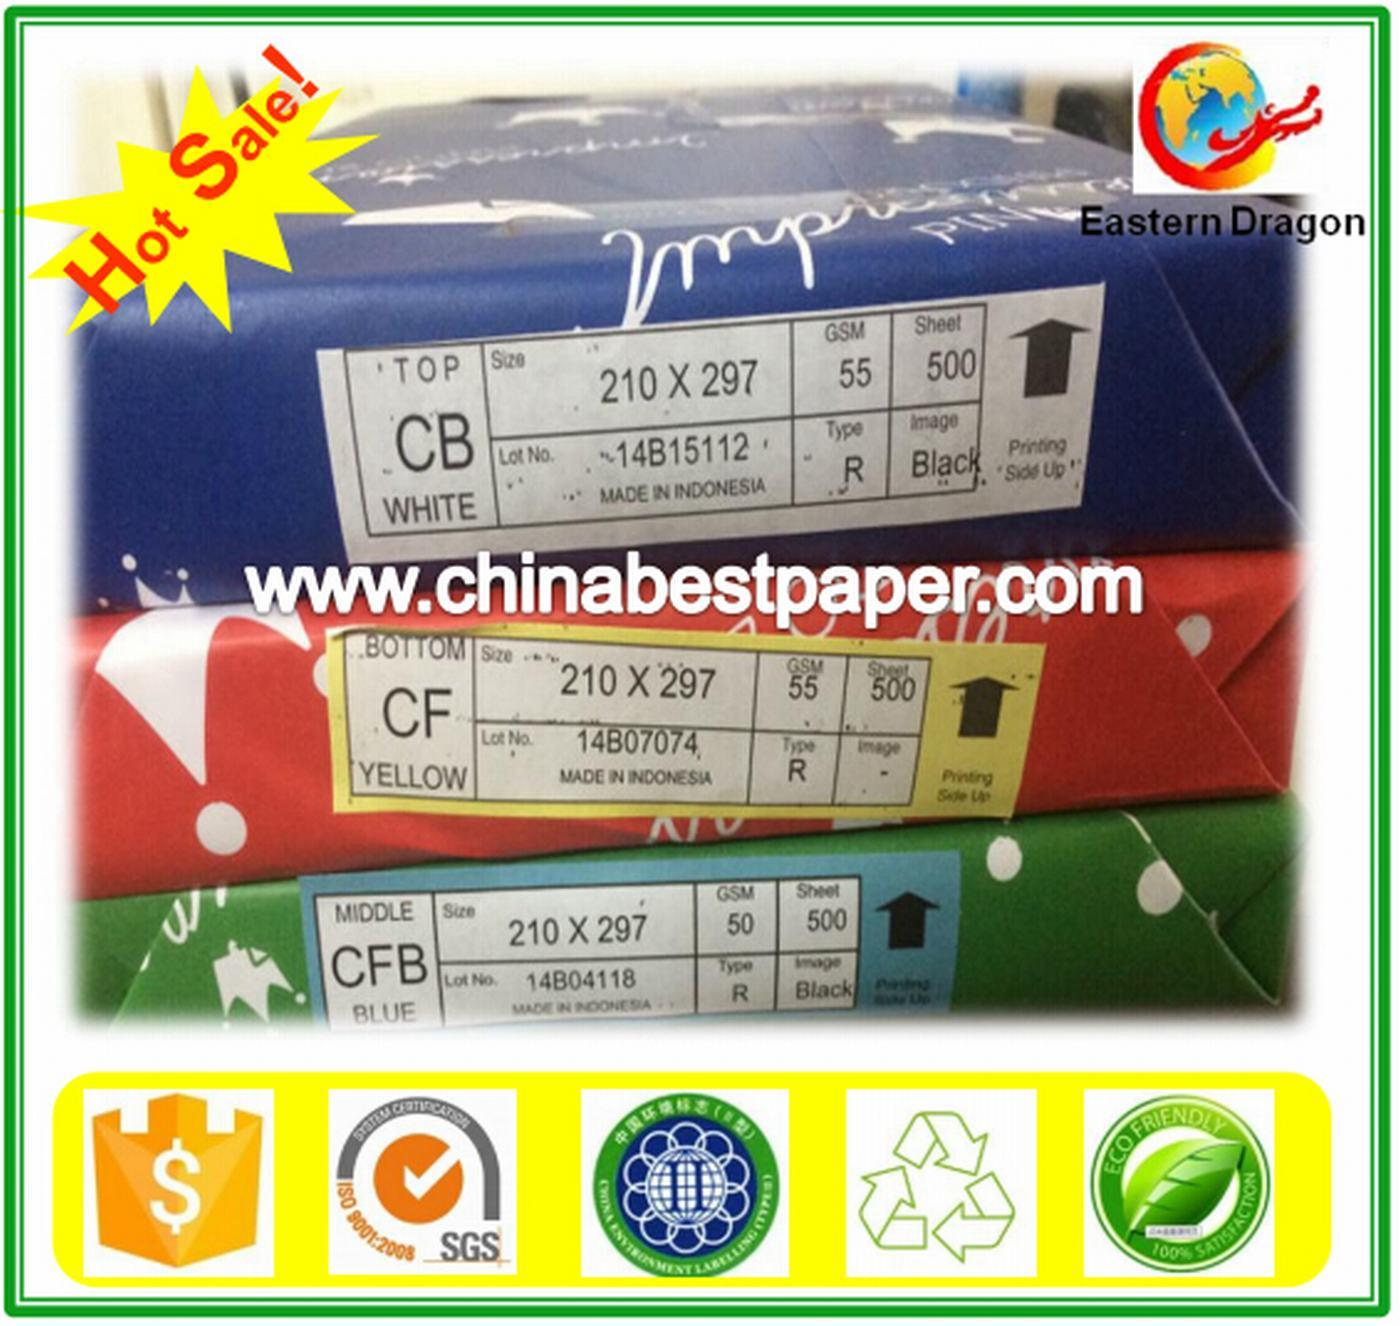 53g Black NCR Ream Carbonless Paper